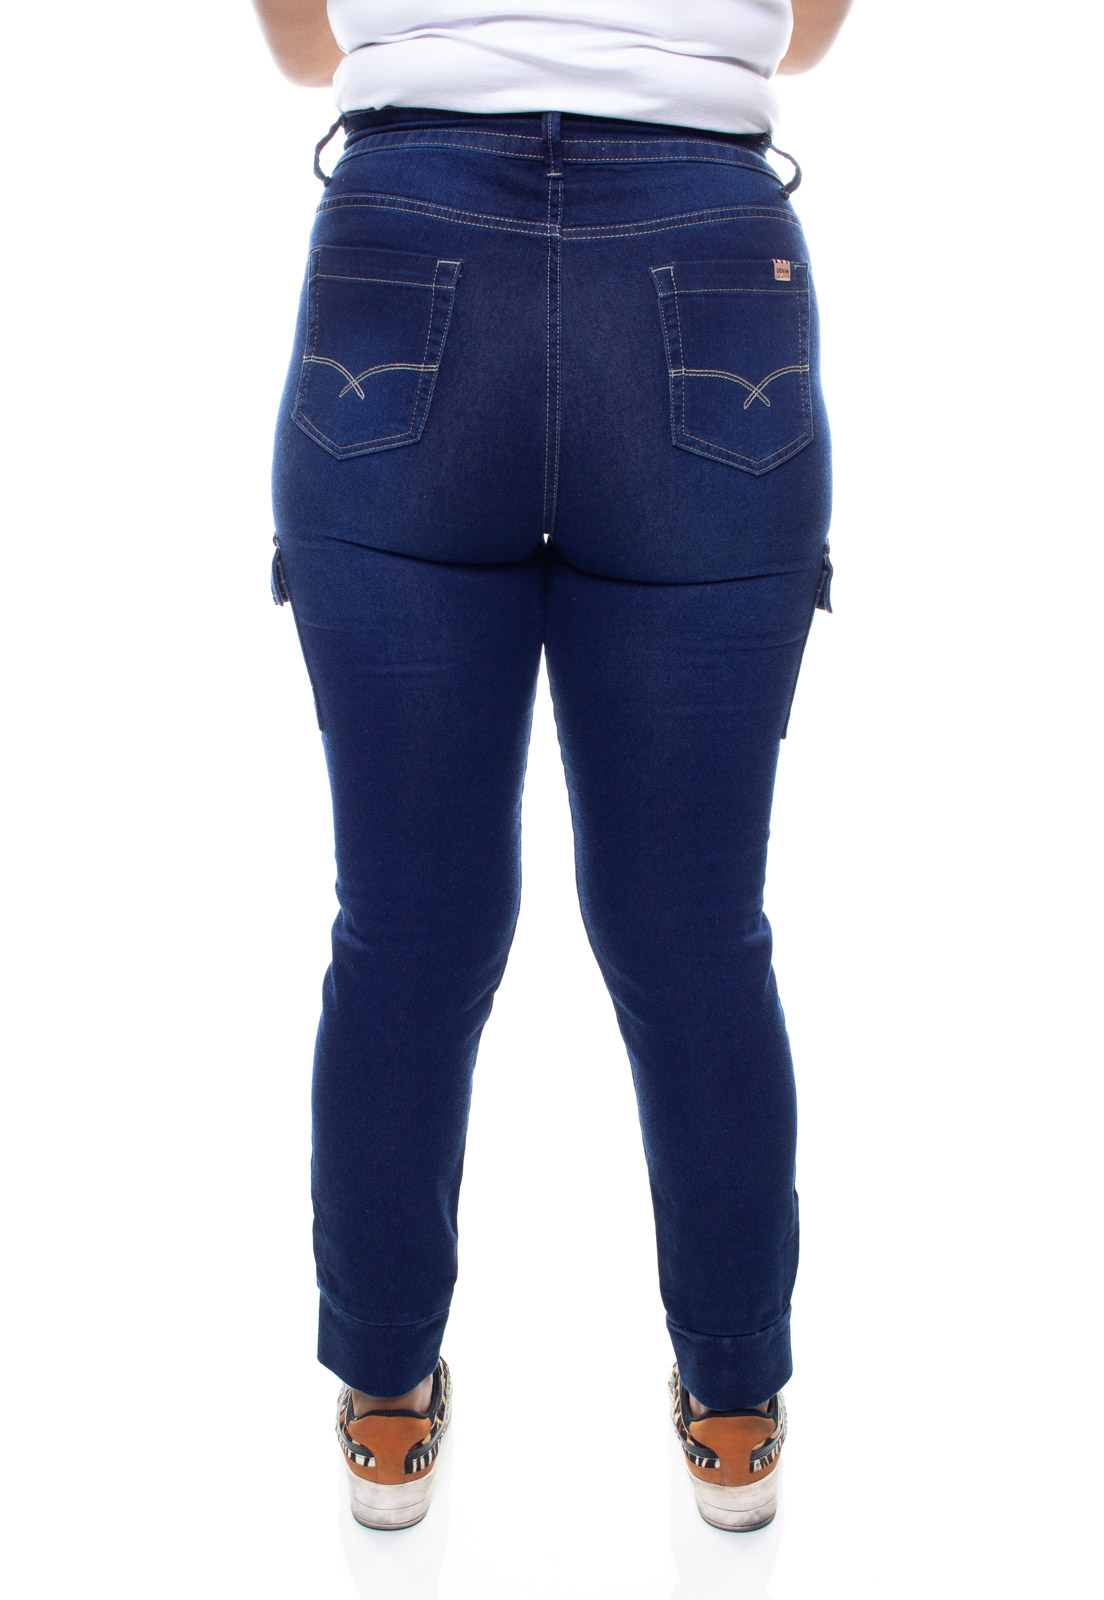 Calça Jeans Plus Size Feminina Bolso Cargo Crocker - 47708  - CROCKER JEANS